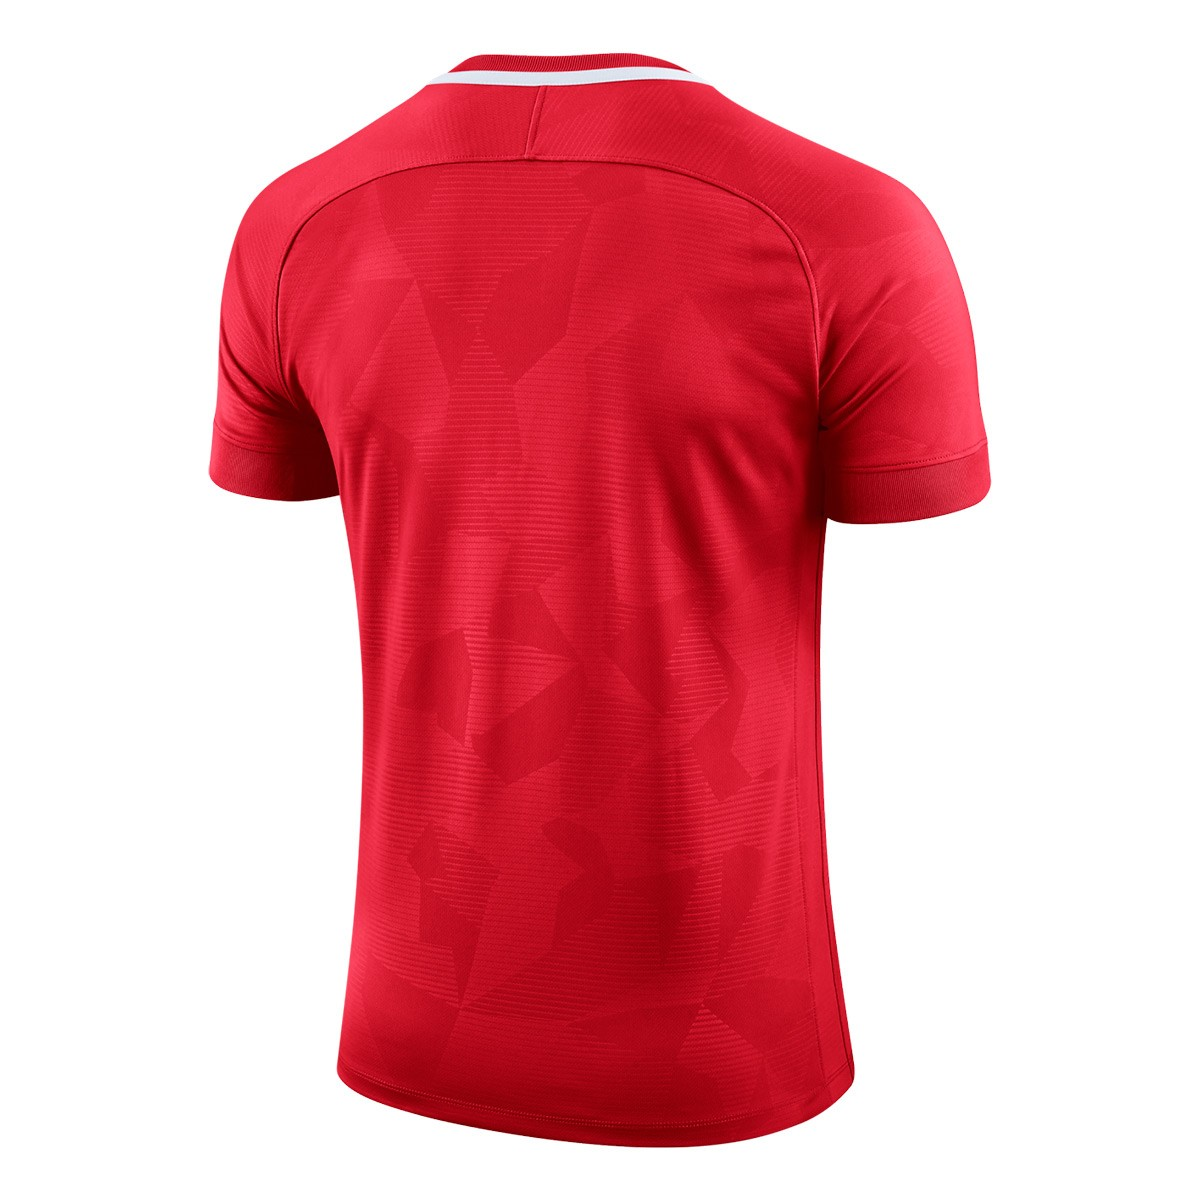 de14777292a8e Playera Nike Challenge II m c University red-White - Soloporteros es ahora  Fútbol Emotion